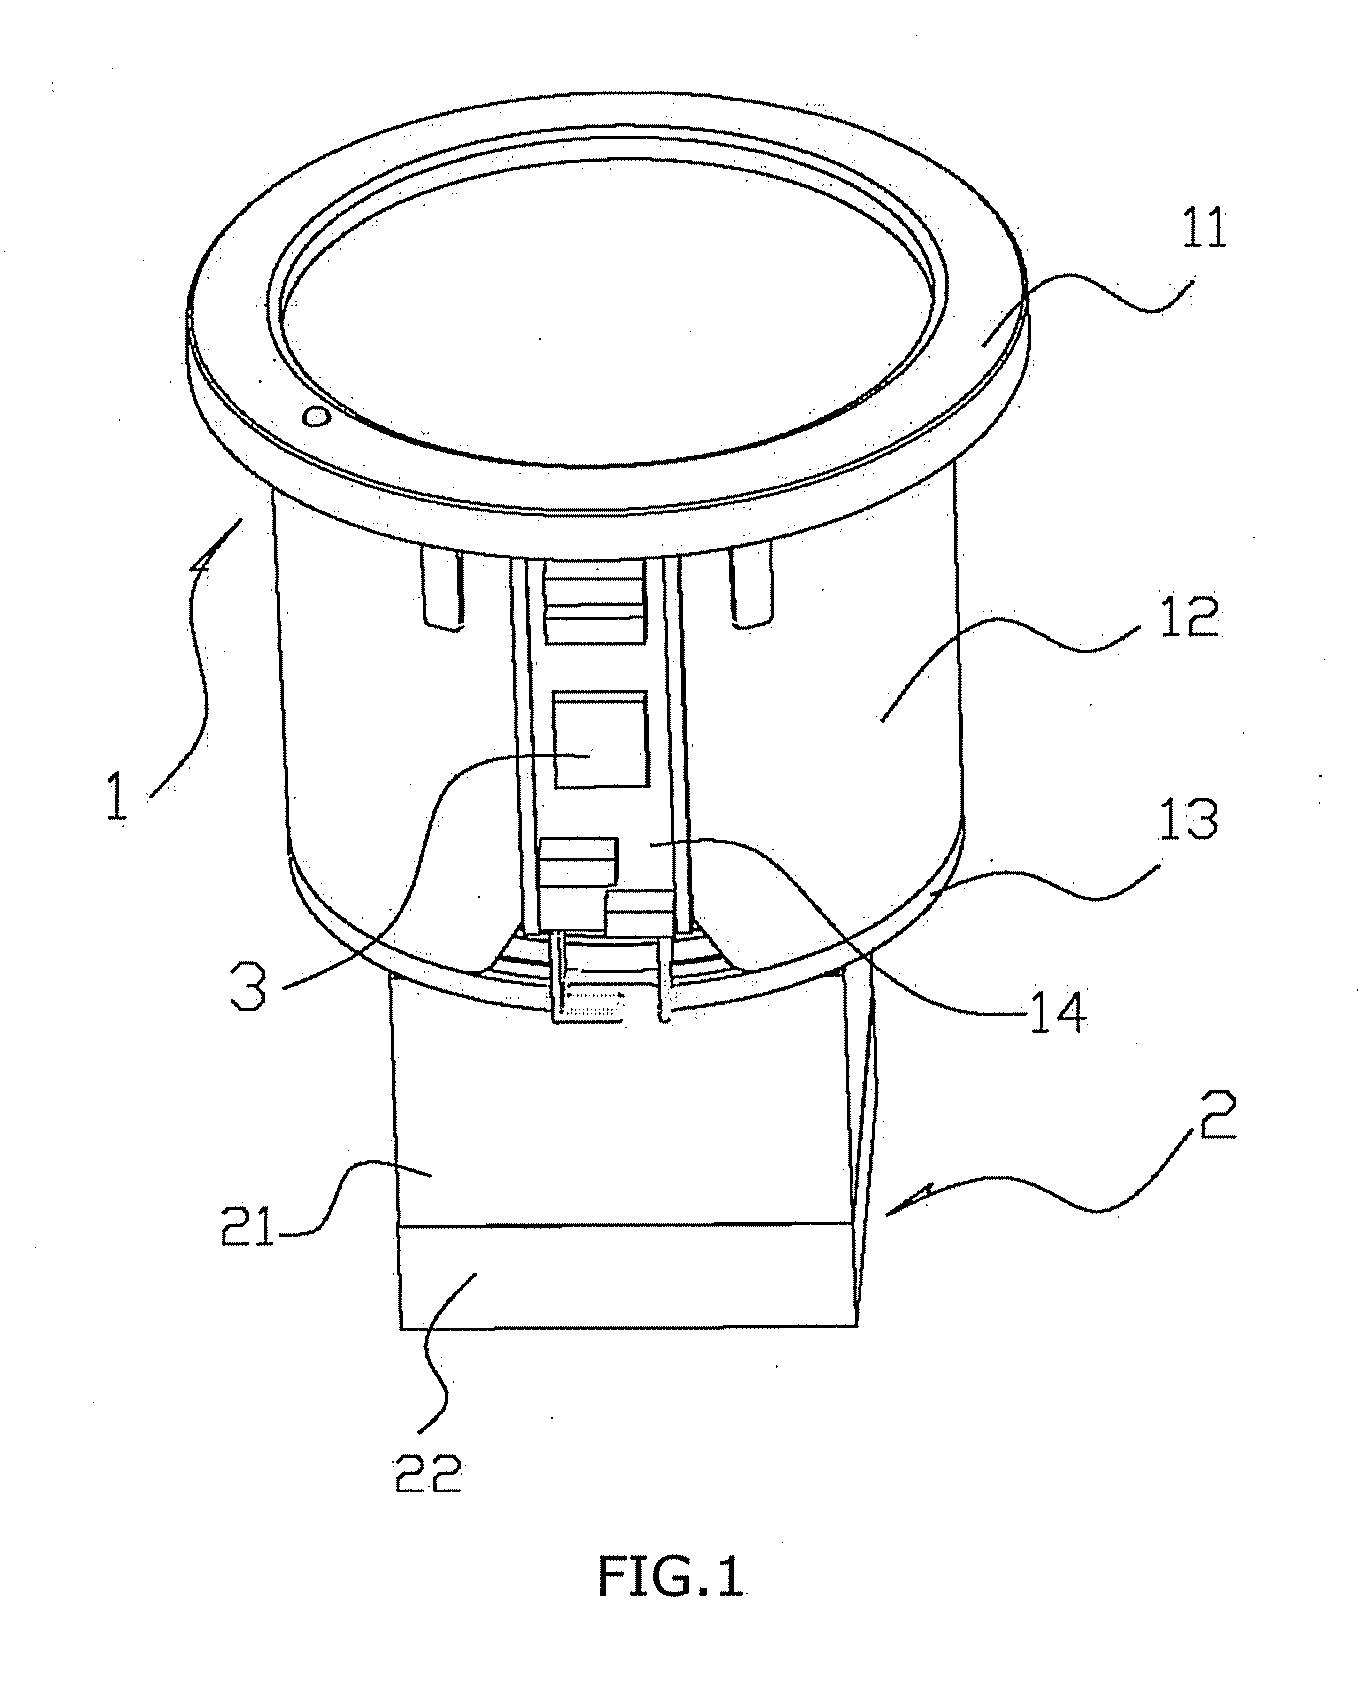 tags: #farmall cub clutch diagram#farmall m carburetor diagram#farmall cub  wiring schematic#1949 farmall cub wiring diagram#farmall cub history#1954  farmall